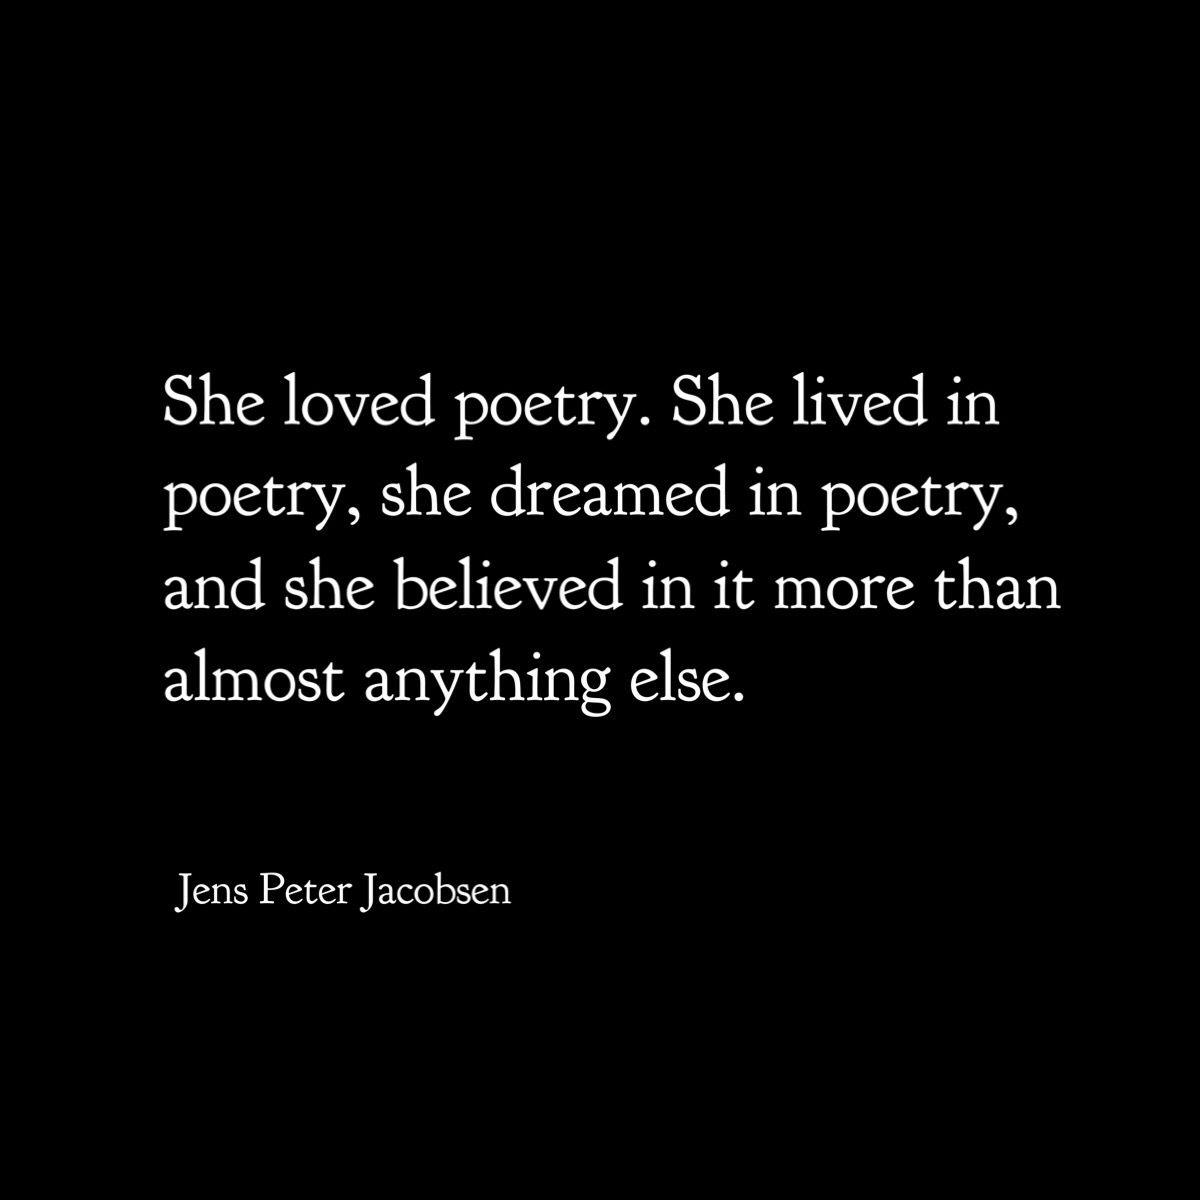 Jens Peter Jacobsen From Niels Lyhne Best Poems Words Beautiful Words